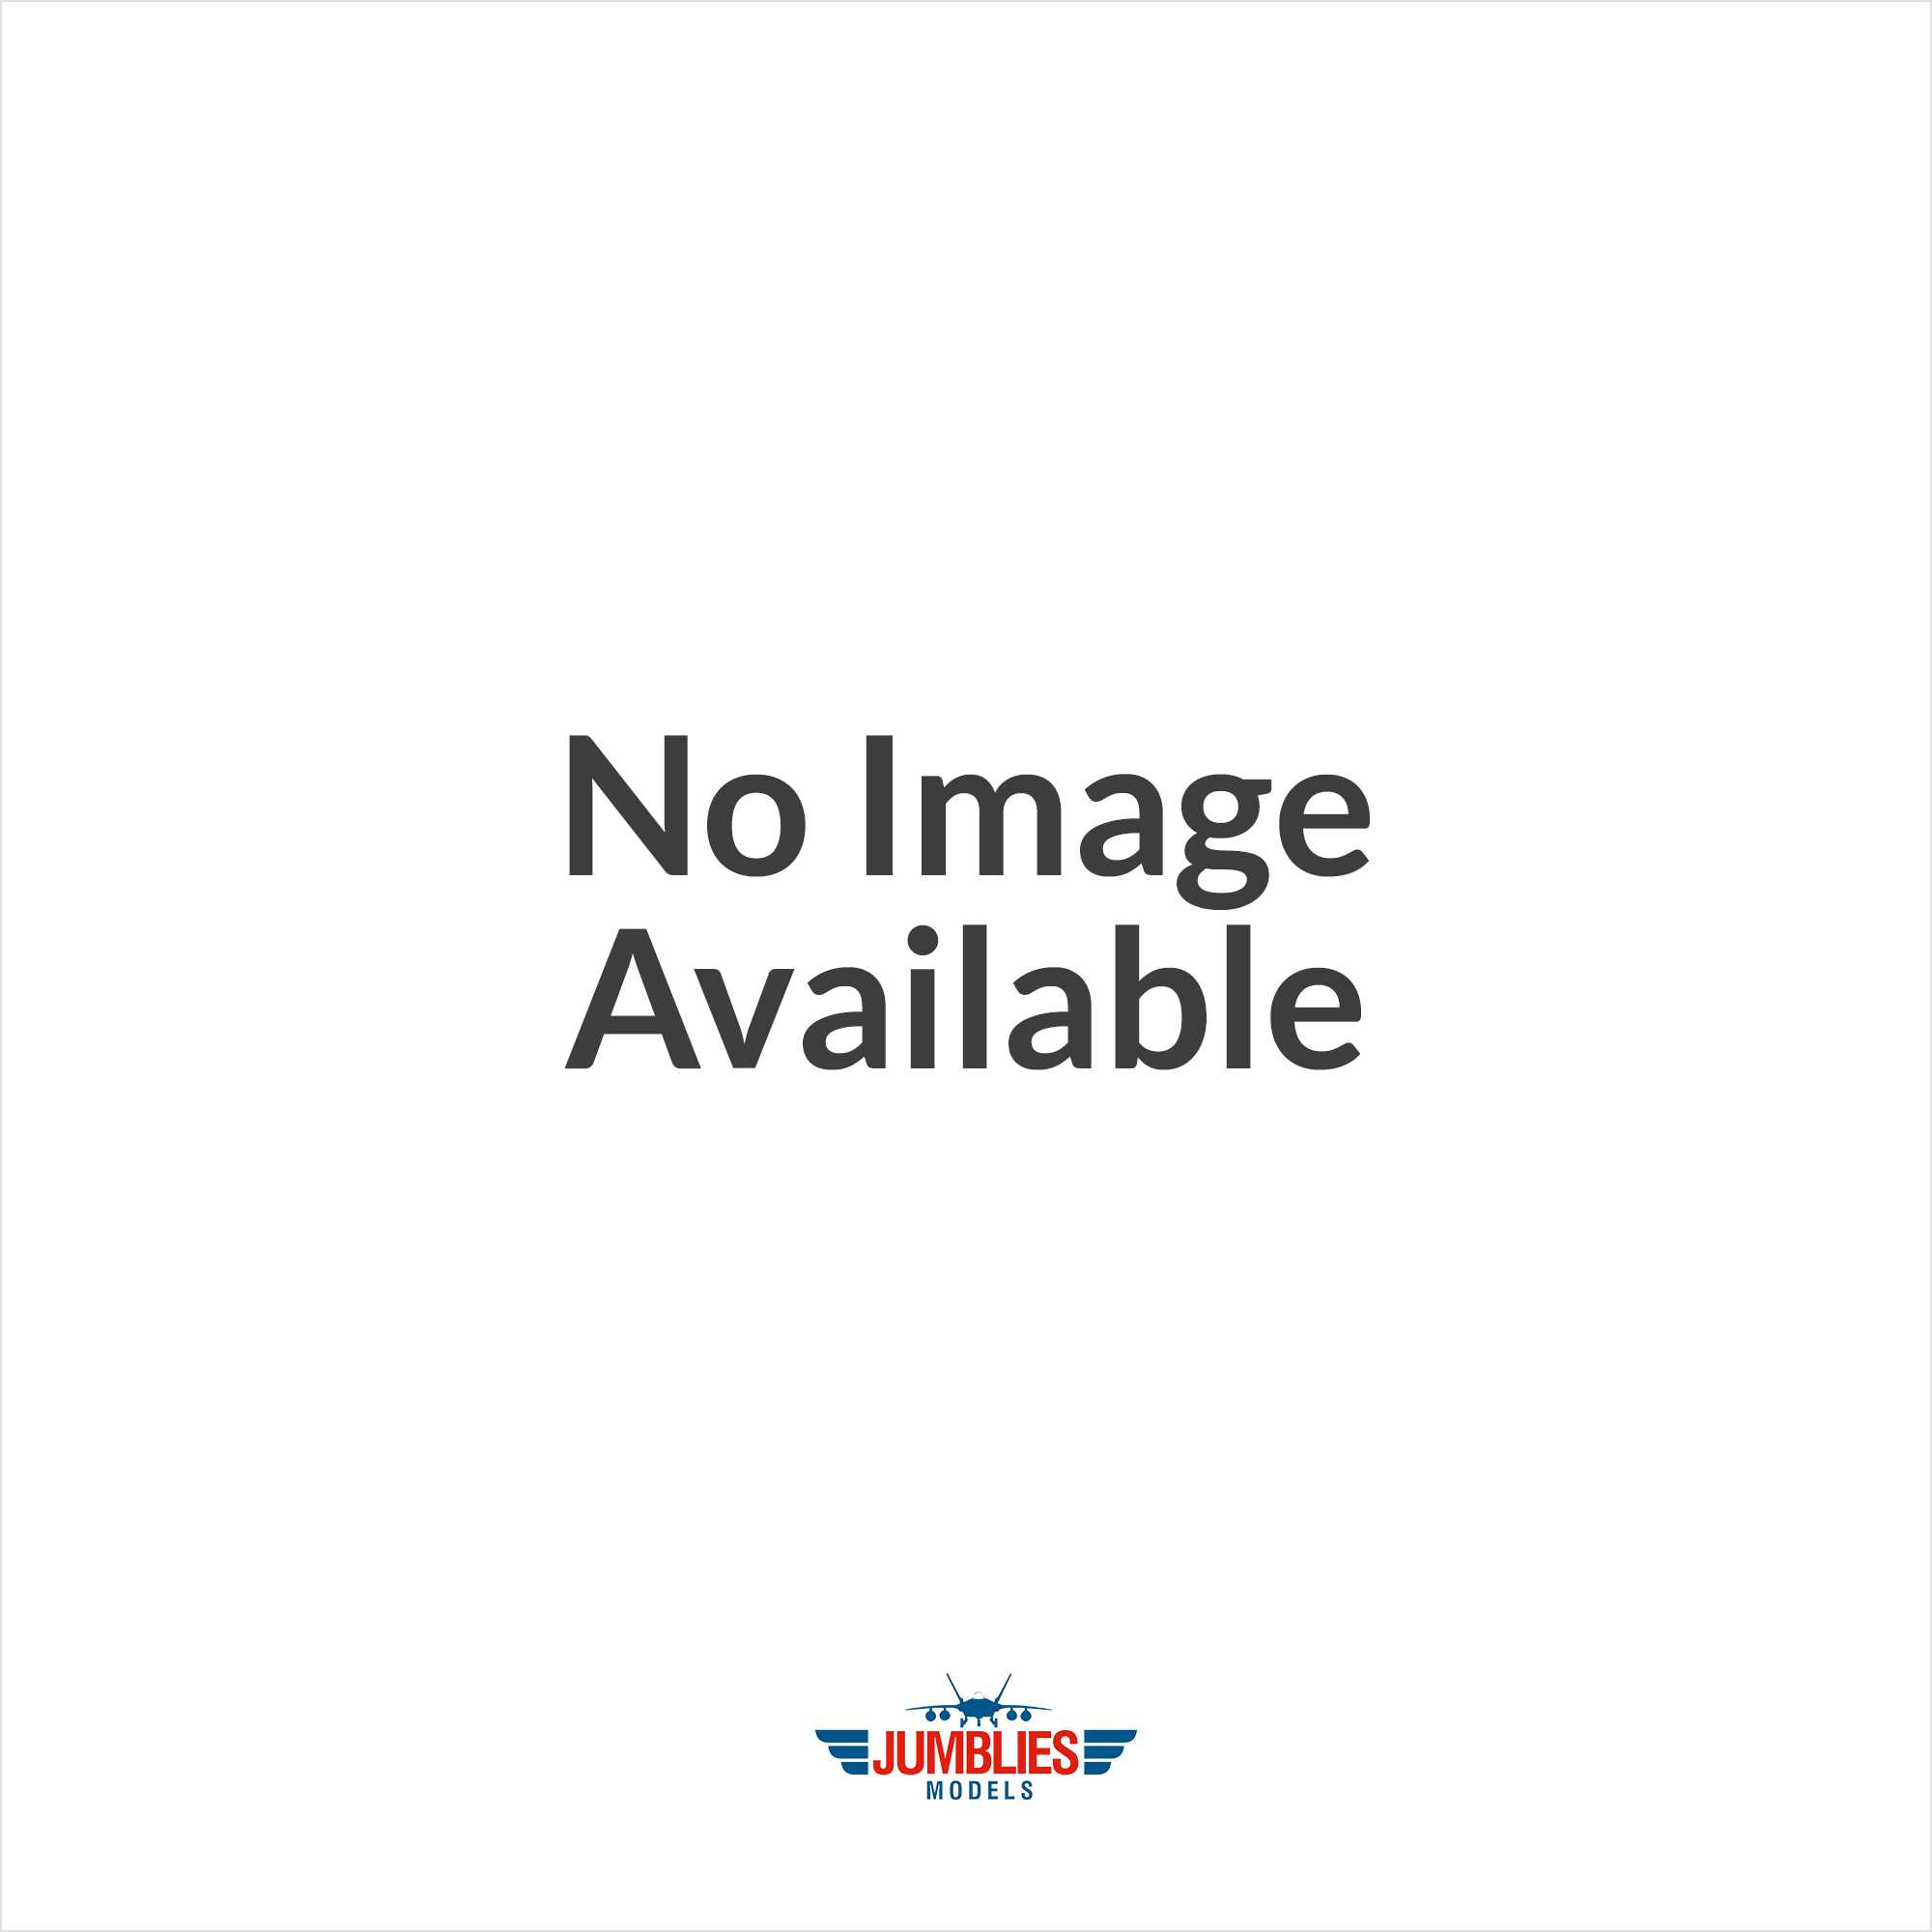 Moebius Models 1:32 BattleStar Galactica Colonial Viper Model Kit